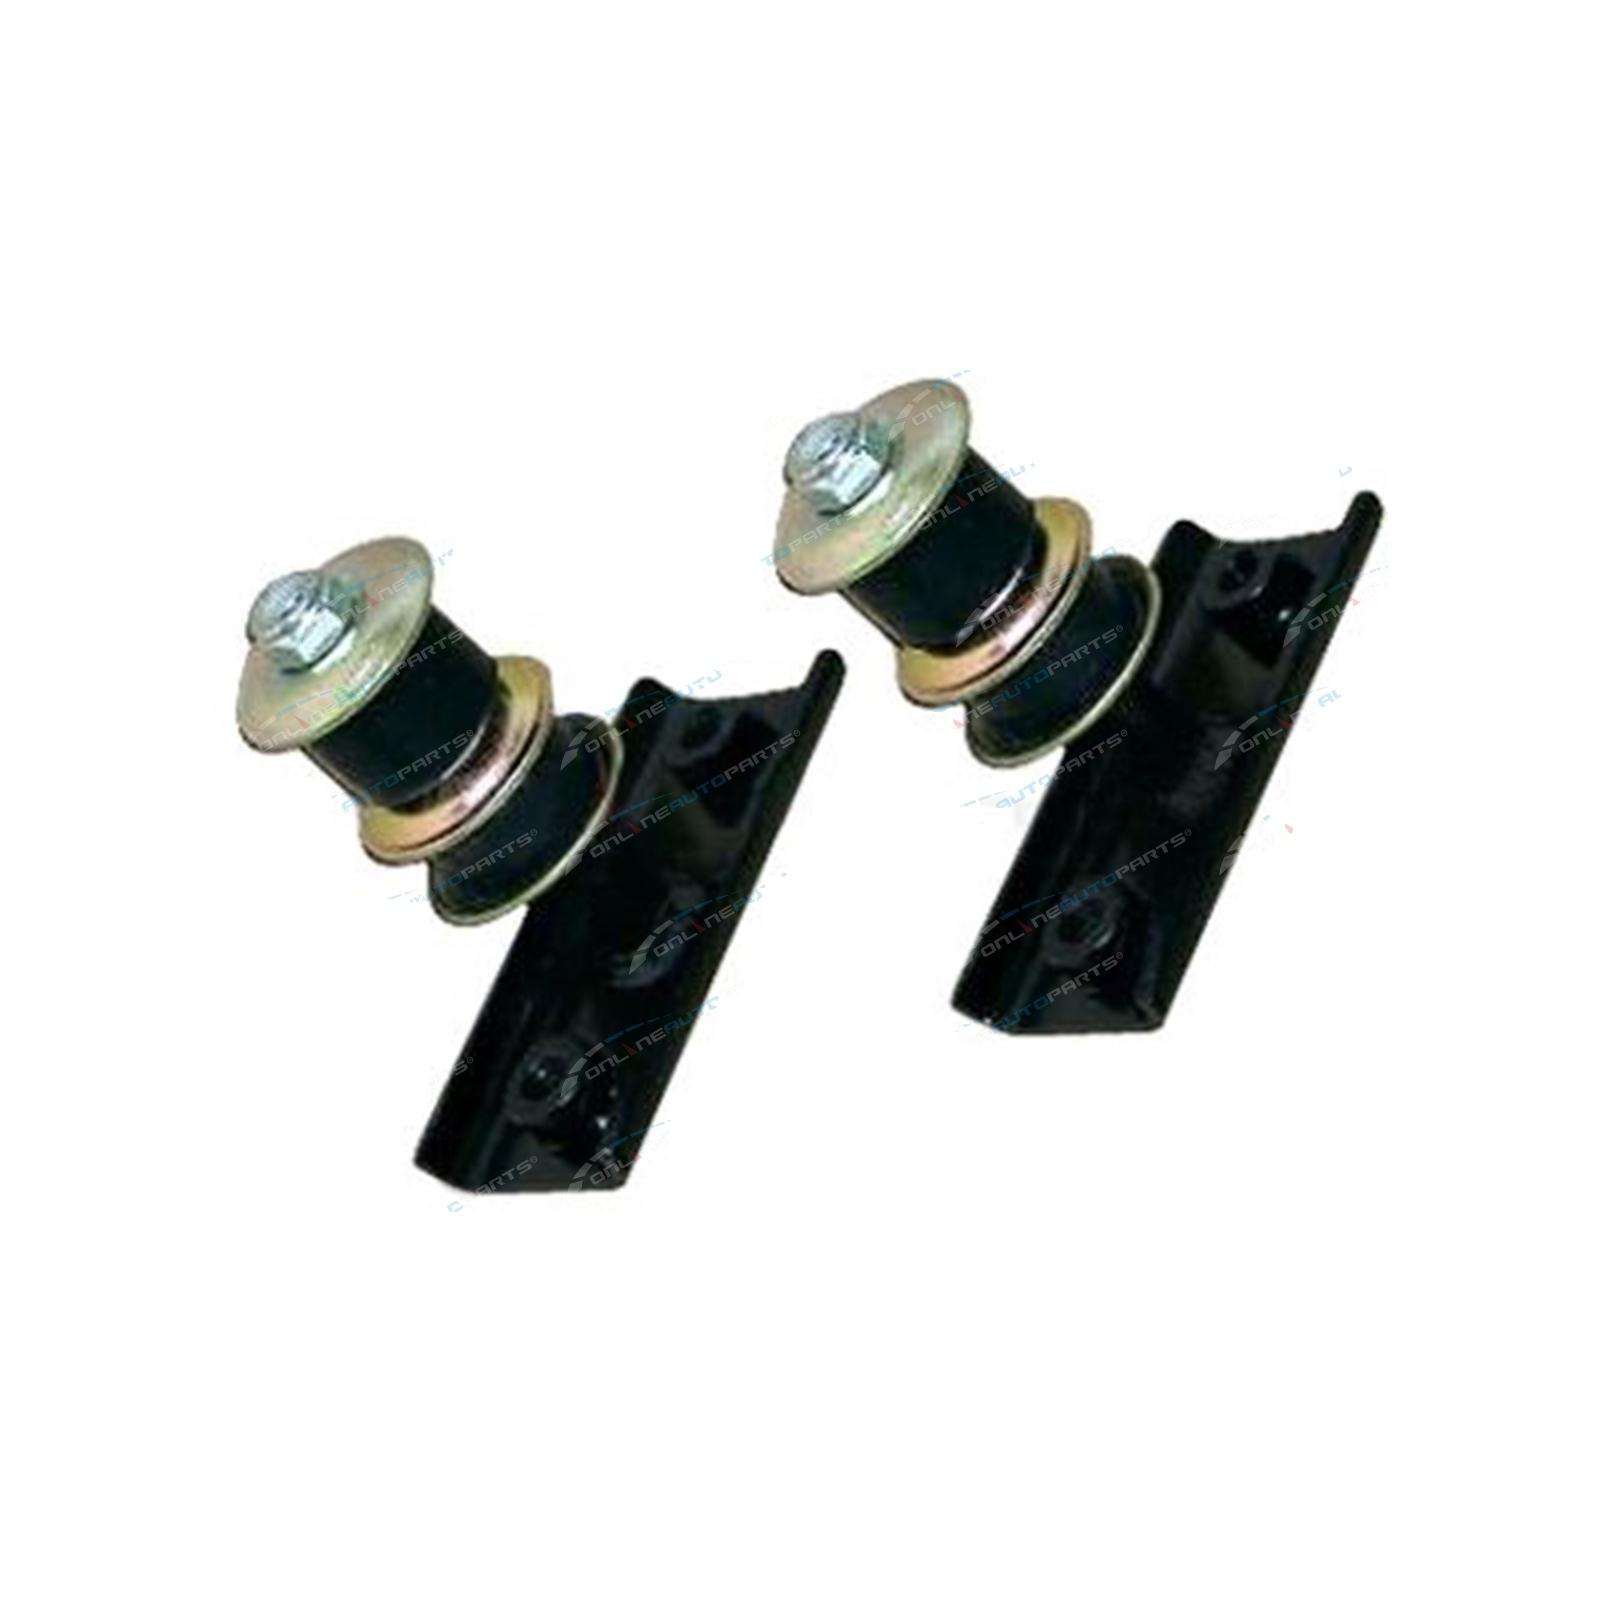 Stabiliser Link Rod Kit Sway Bar Link Japanese OEM Replacement